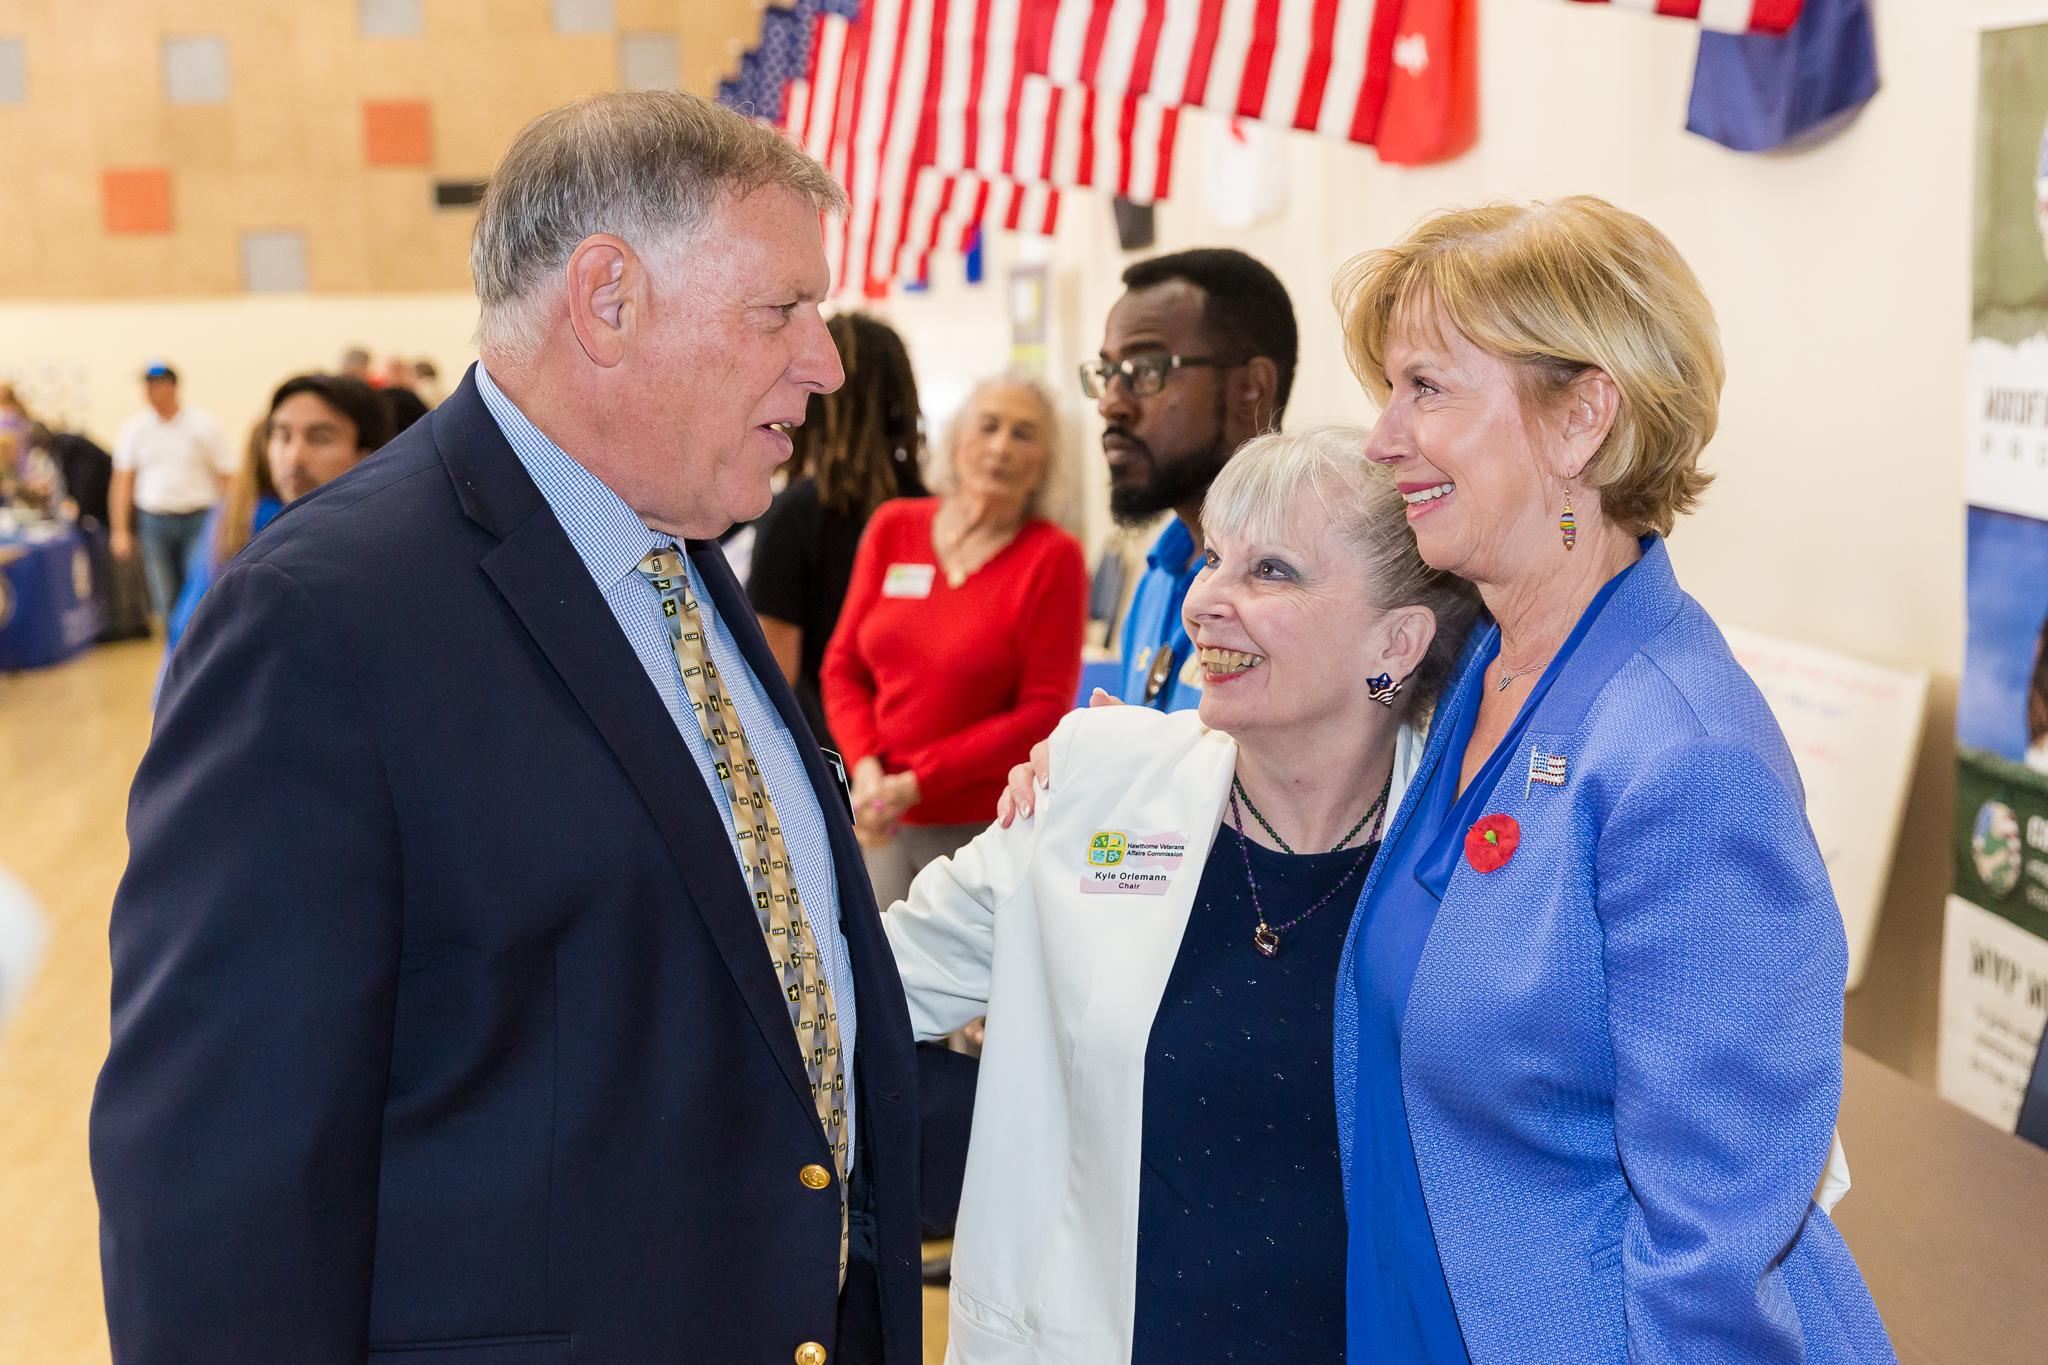 Neil Gafney and Supervisor 4th District Janice Hahn